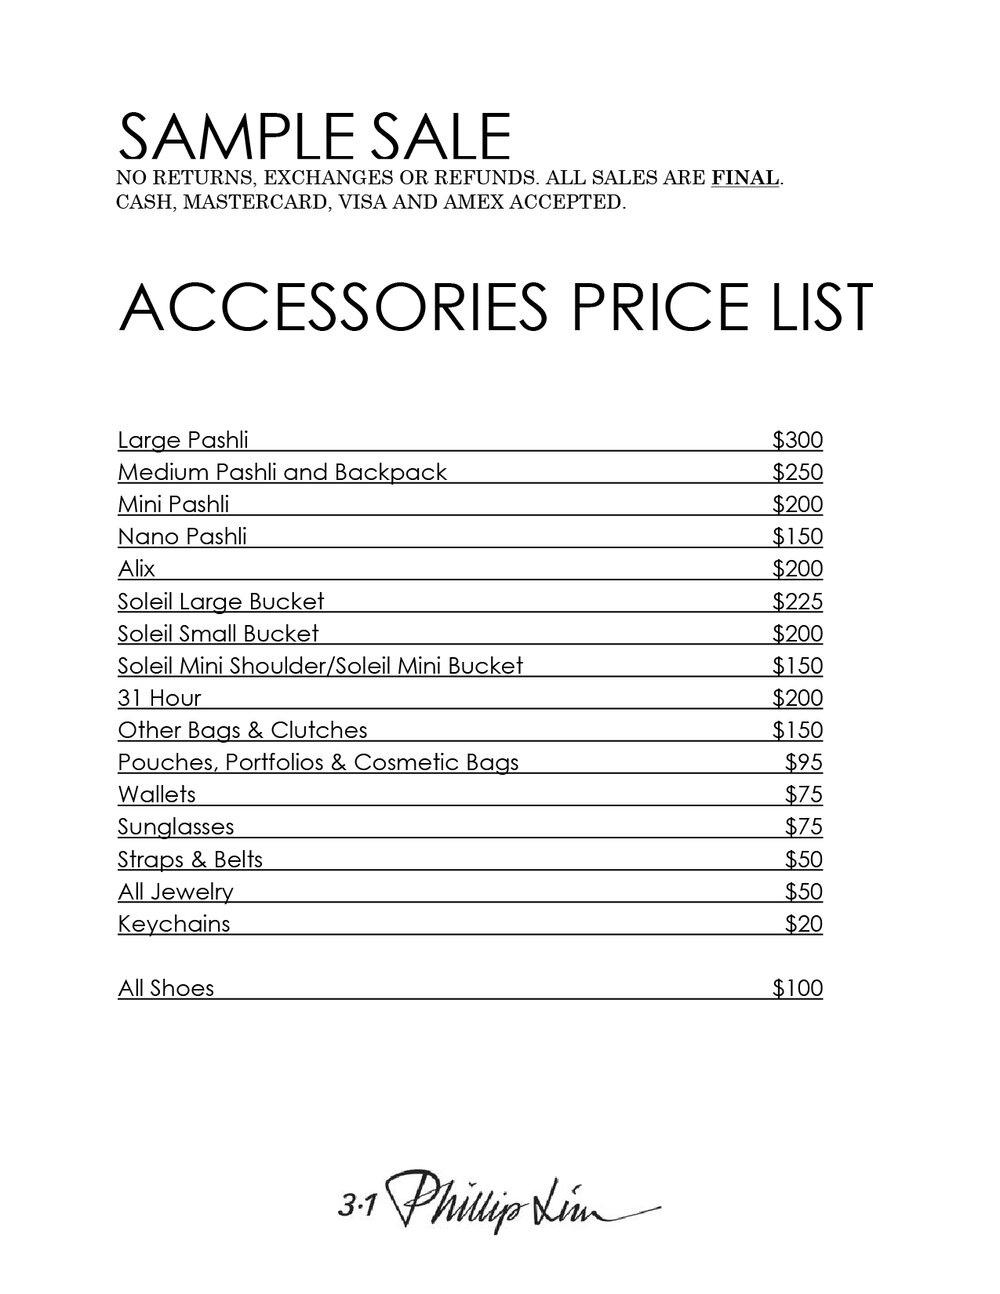 3.1 Phillip Lim Sample Sale in Images